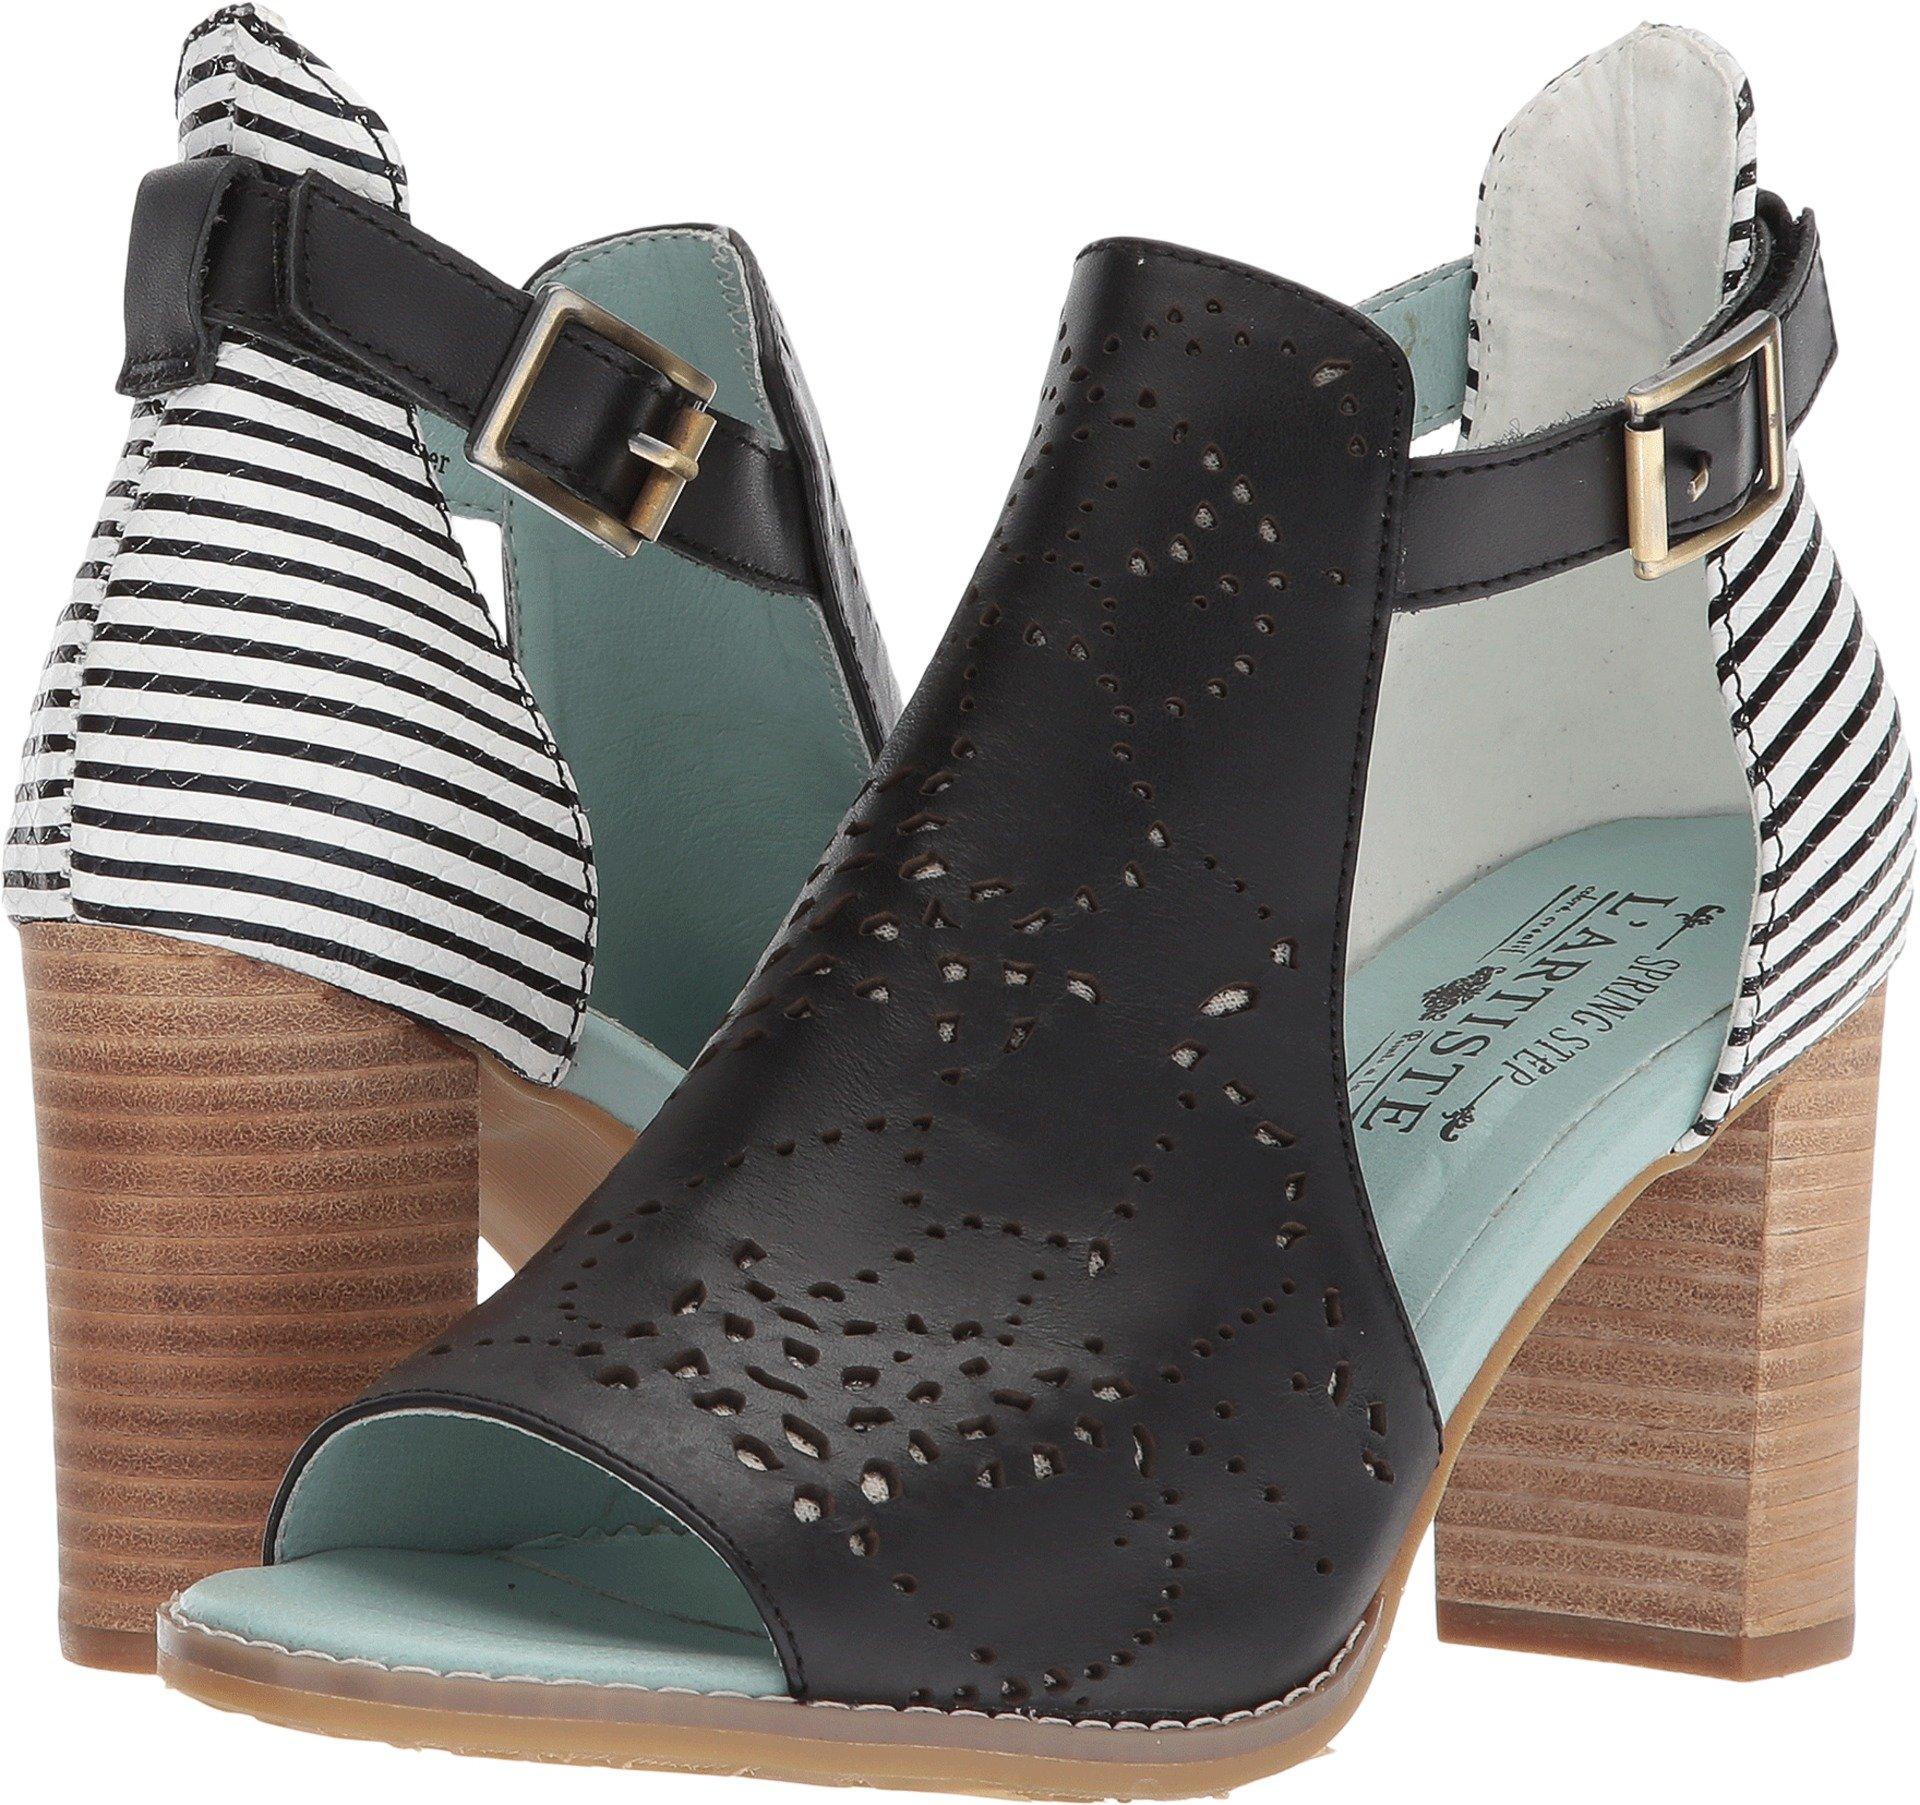 L'Artiste by Spring Step Women's Style Lashon Black Multi EURO Size 41 Leather Sandal